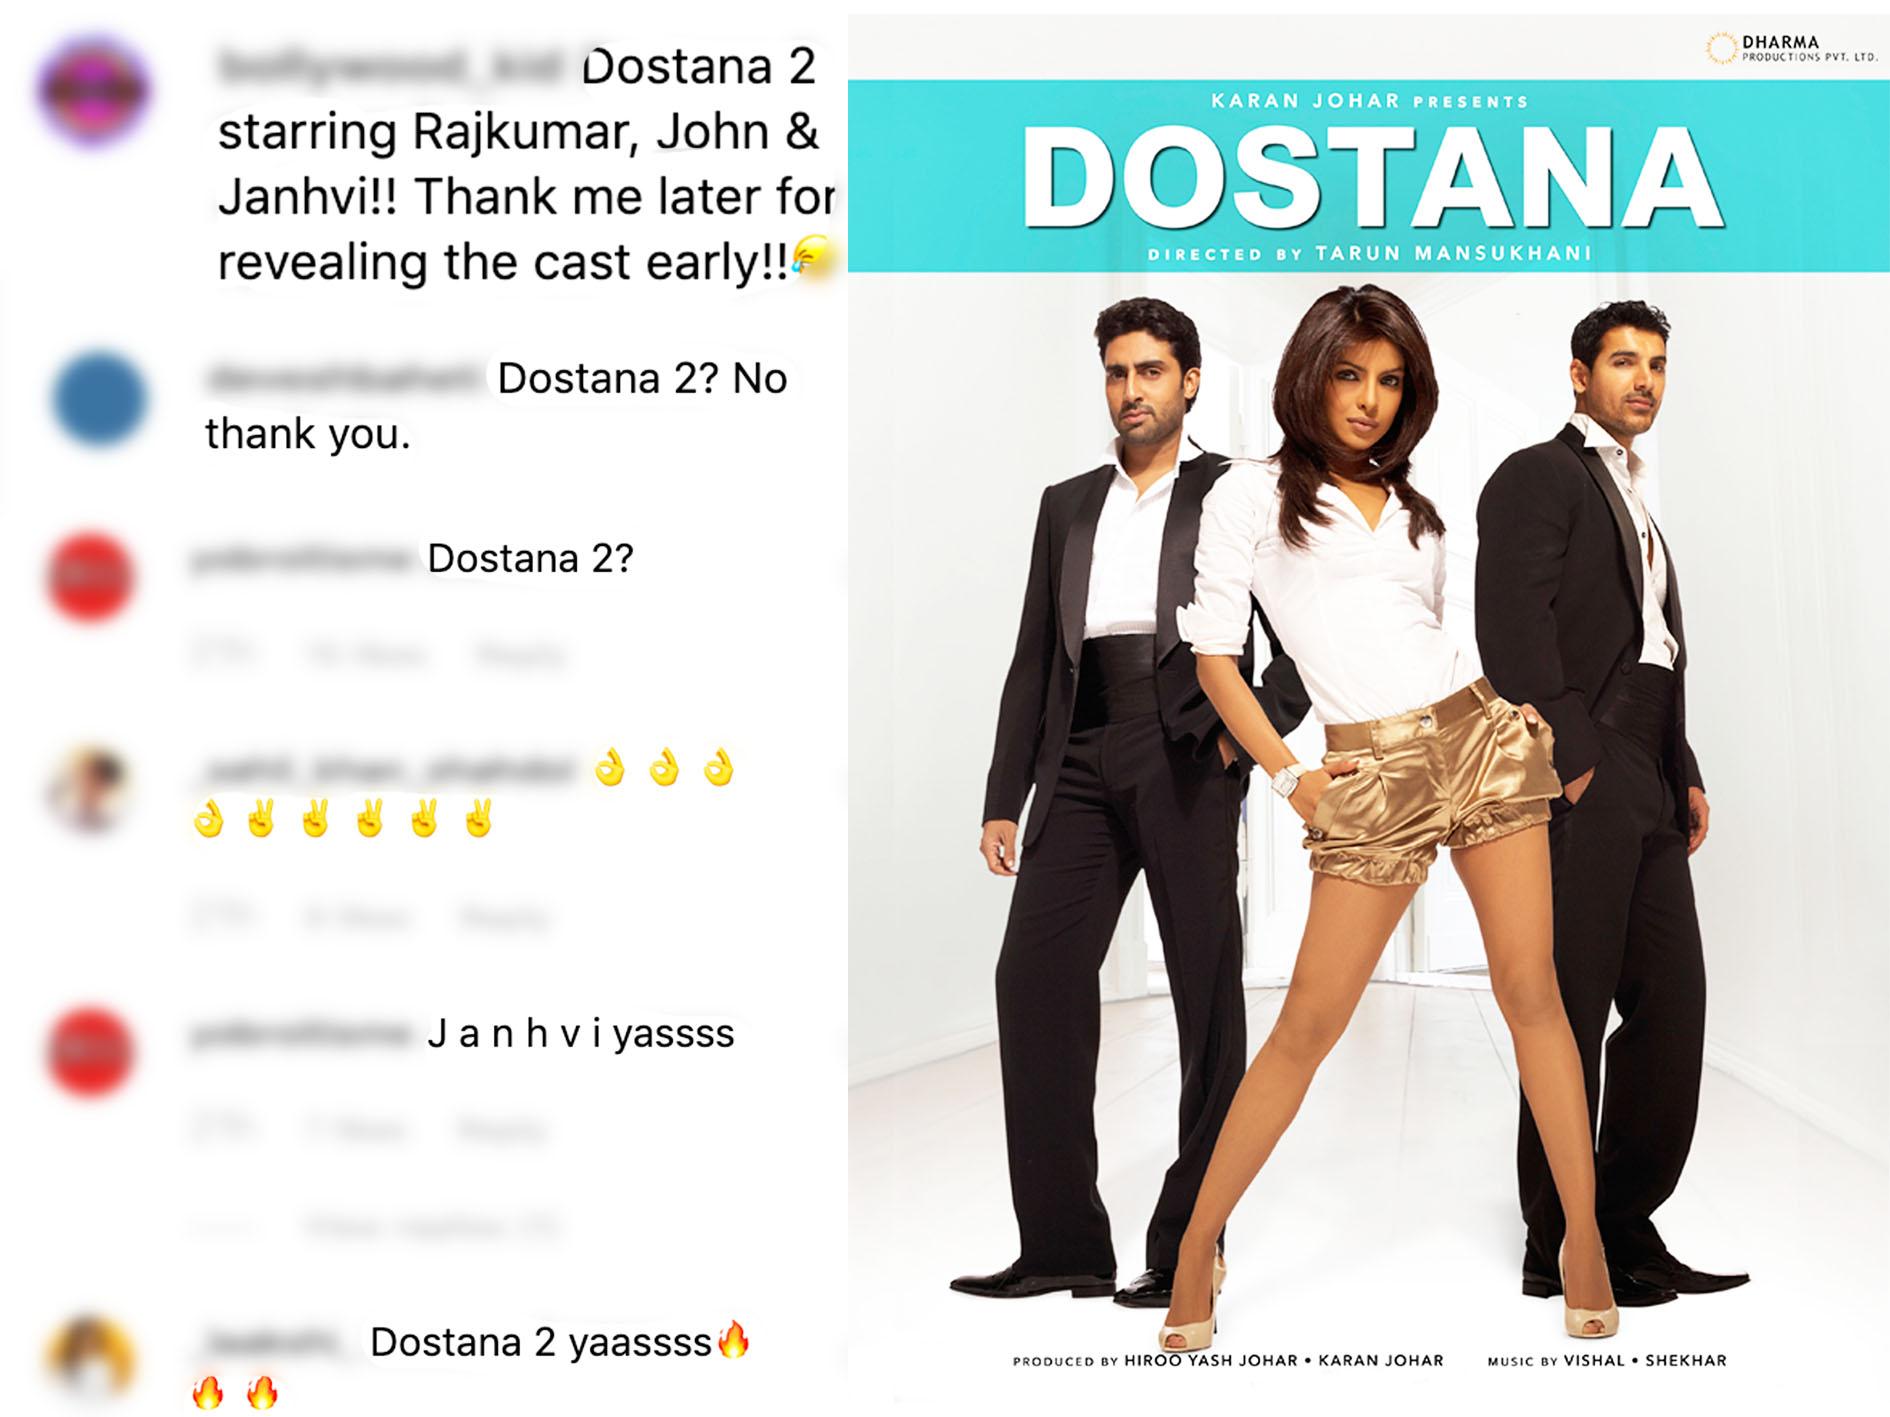 Dostana 2! Karan Johar Picks Kartik Aaryan and Janhvi Kapoor for Sequel